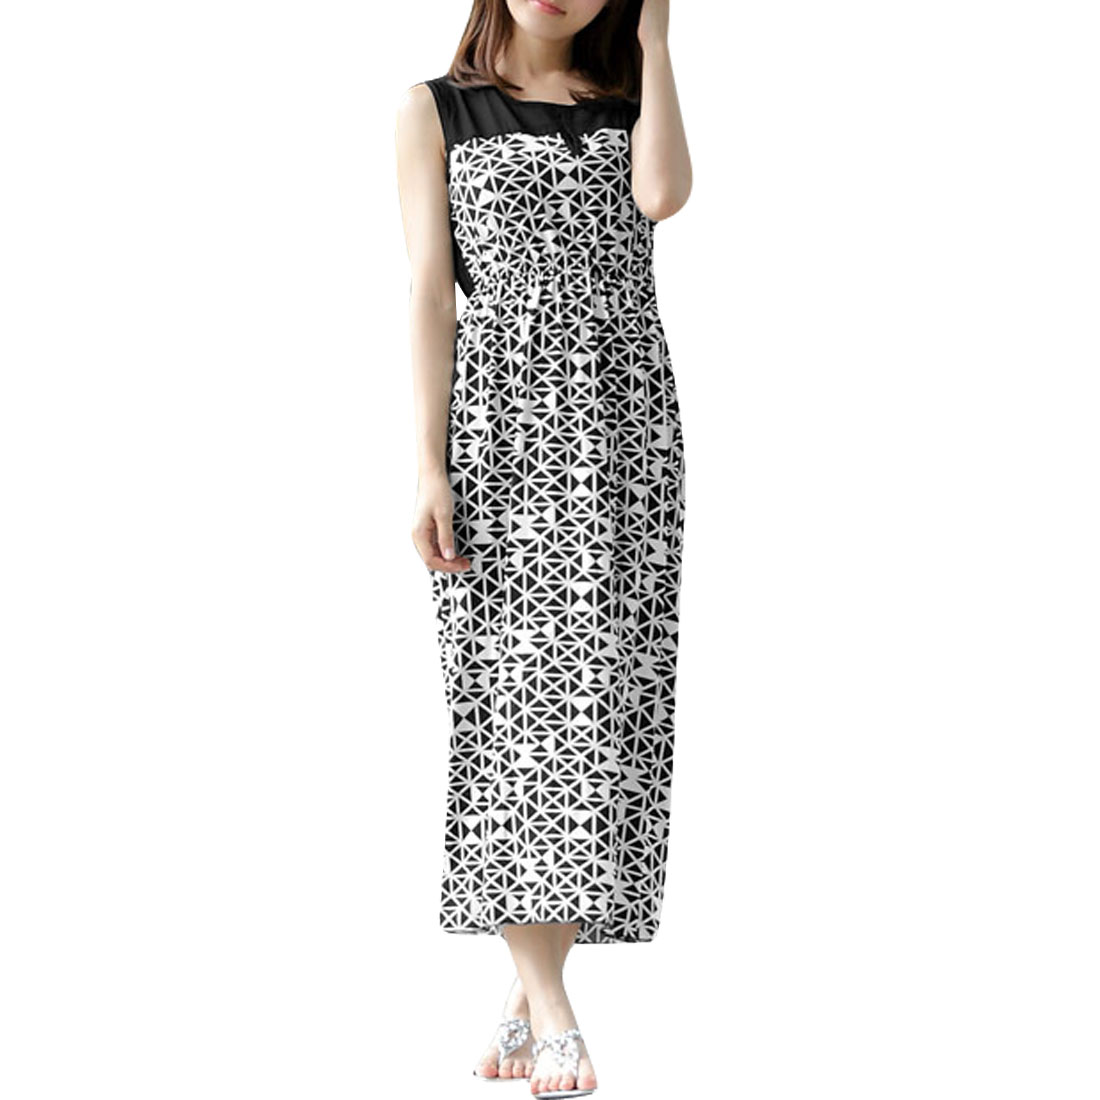 Ladies Elastic Waist Round Neck Semi Sheer Back Pullover Dress S Black White